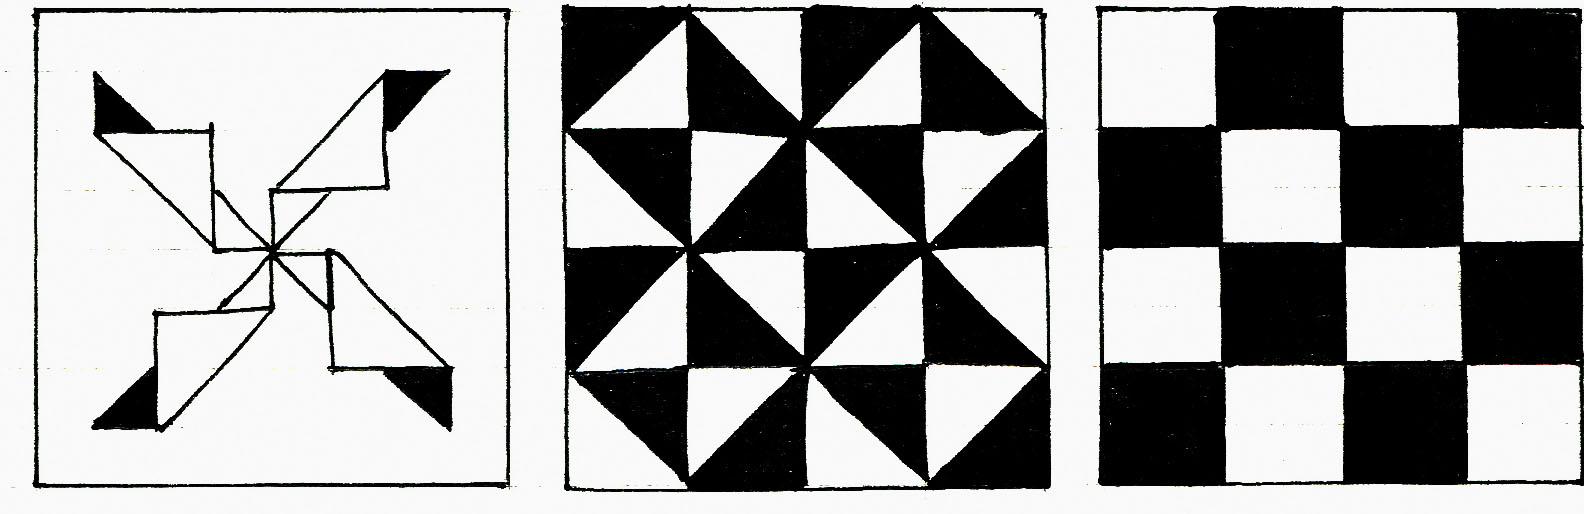 Luke_Fisher_DDV_Blog: Repetition/Rhythm Drawings